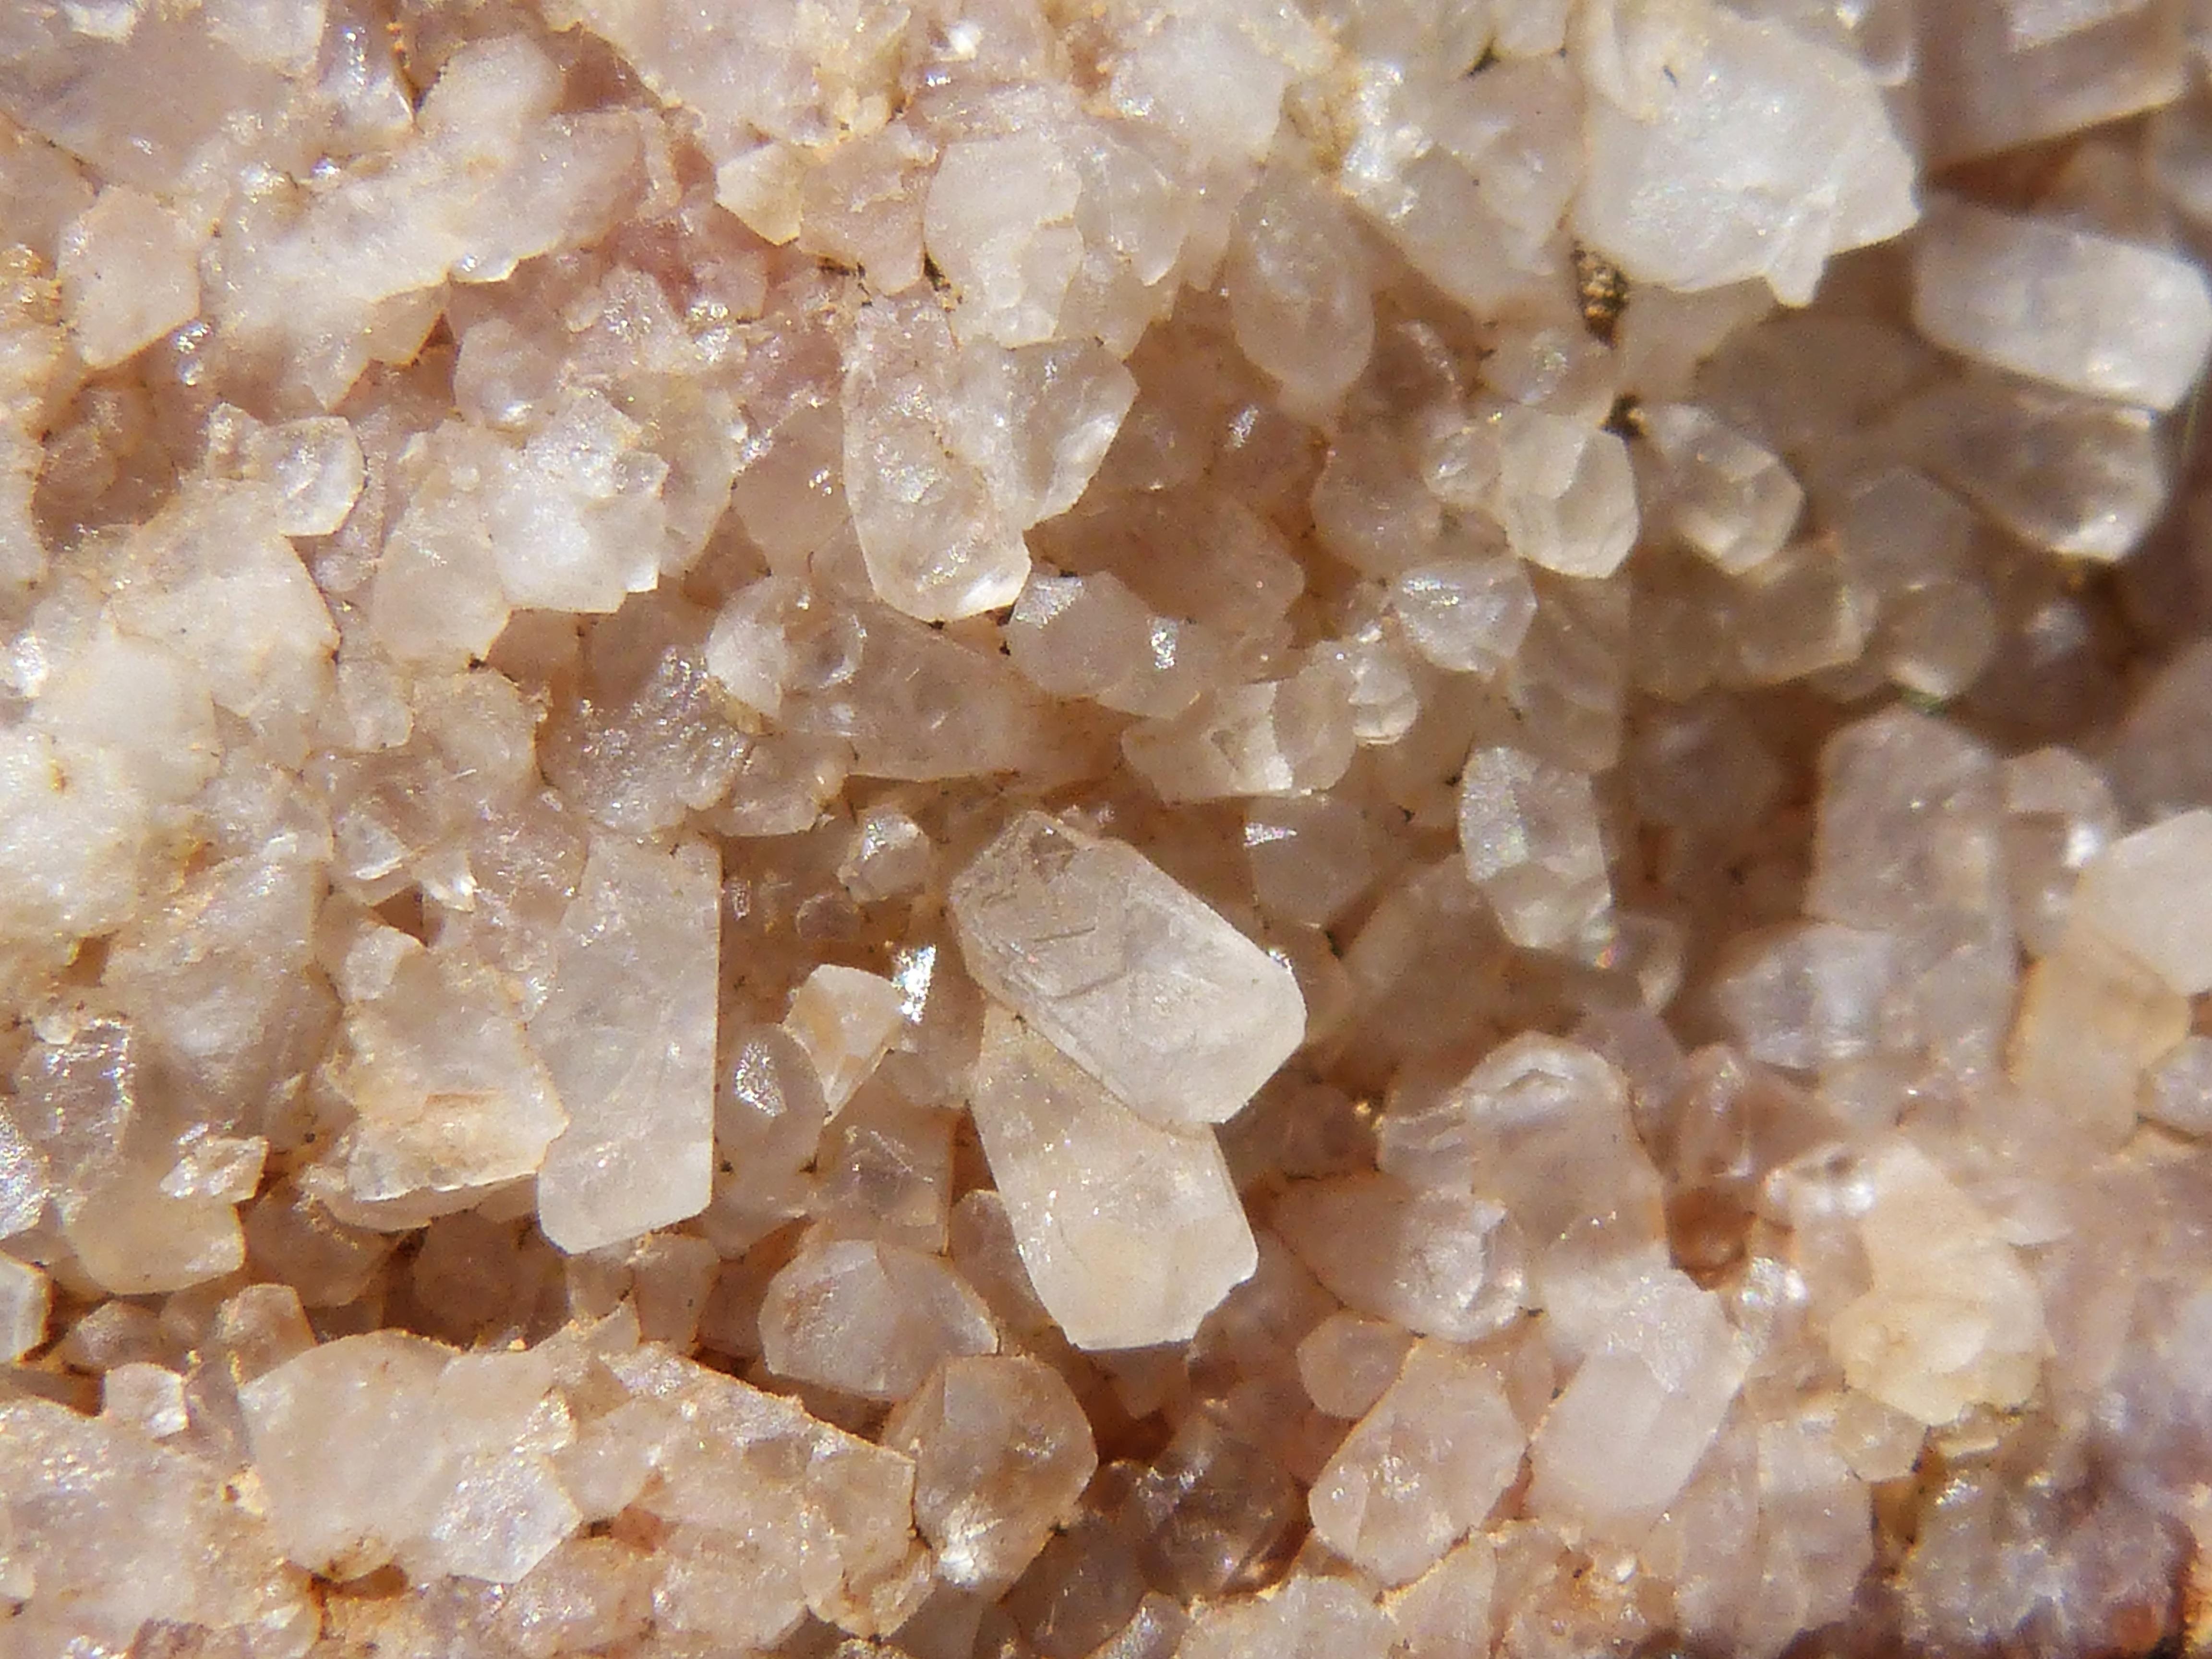 Bildet Materiale Mineraler Mineral Natriumklorid